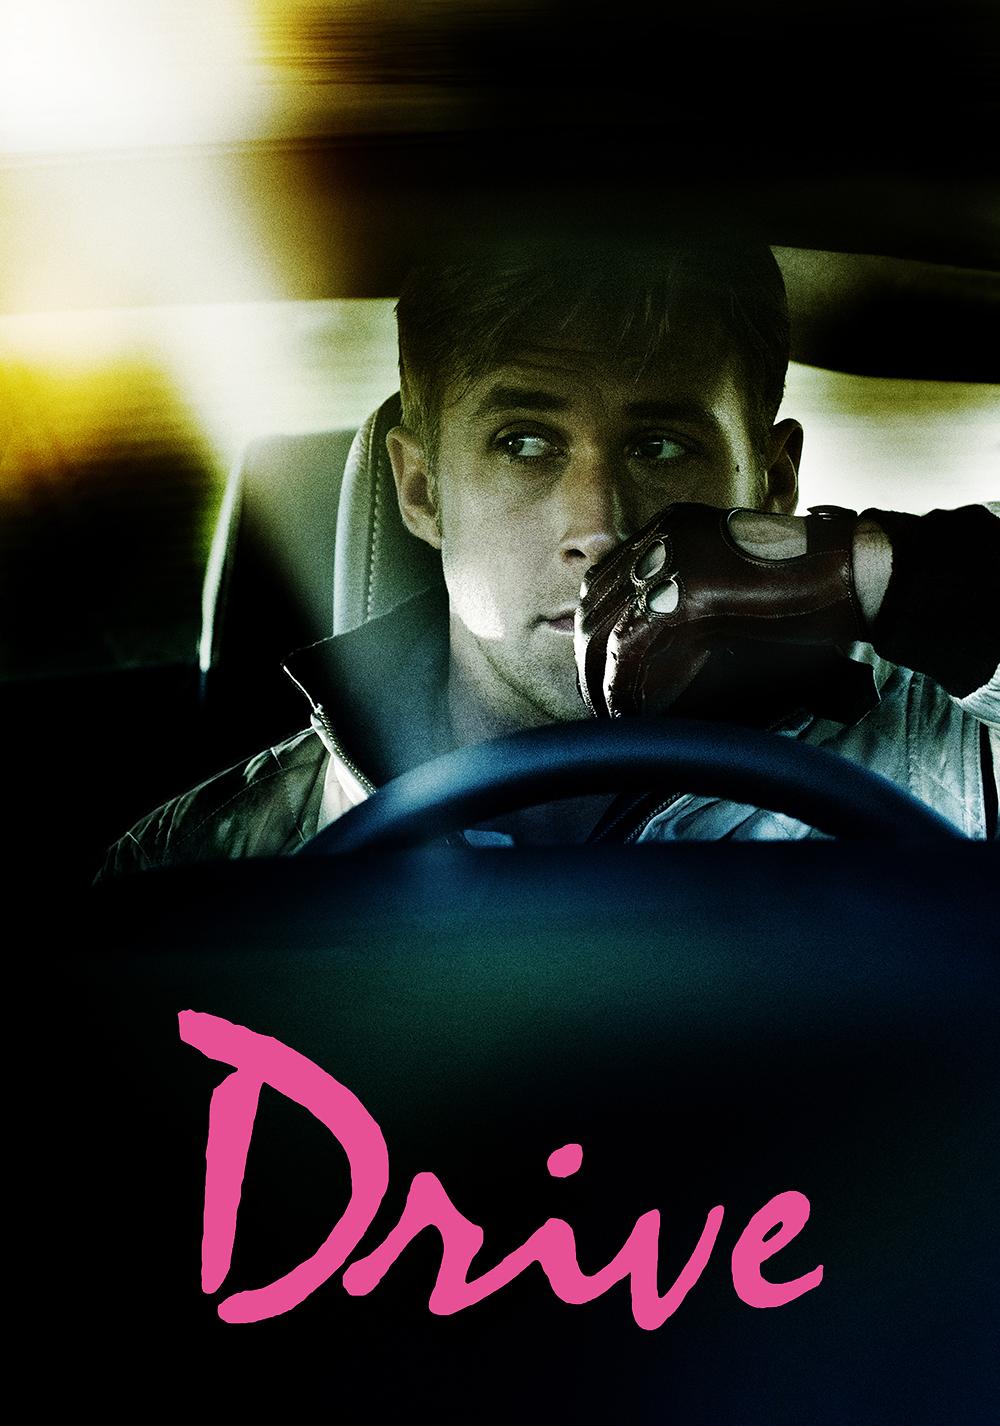 Drive (2011) | BRRip 1080p x265 | Inglés